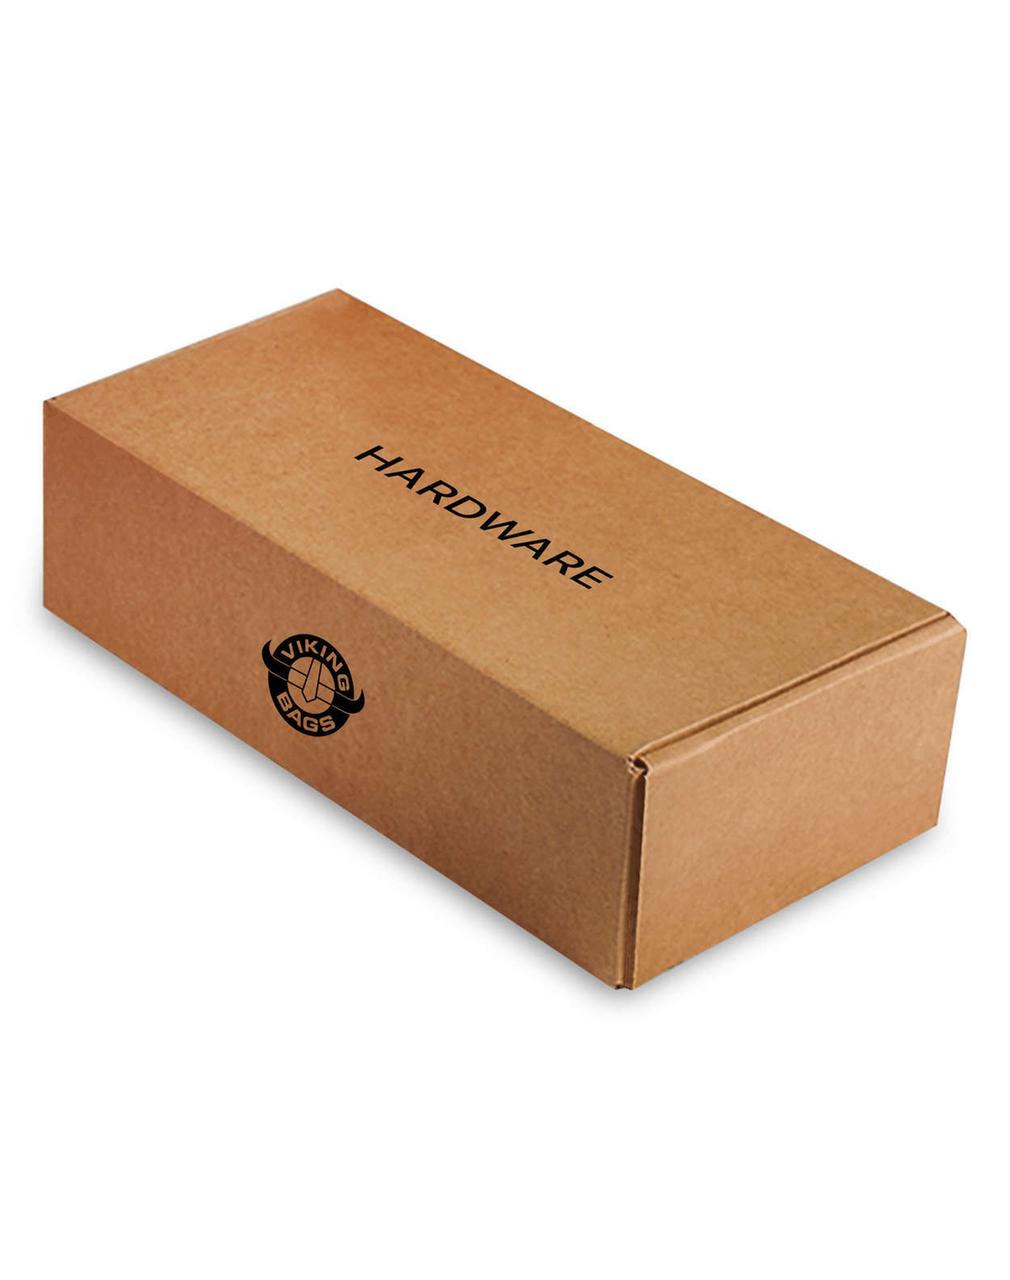 Honda VTX 1800 N Warrior Slanted Motorcycle Saddlebags Box